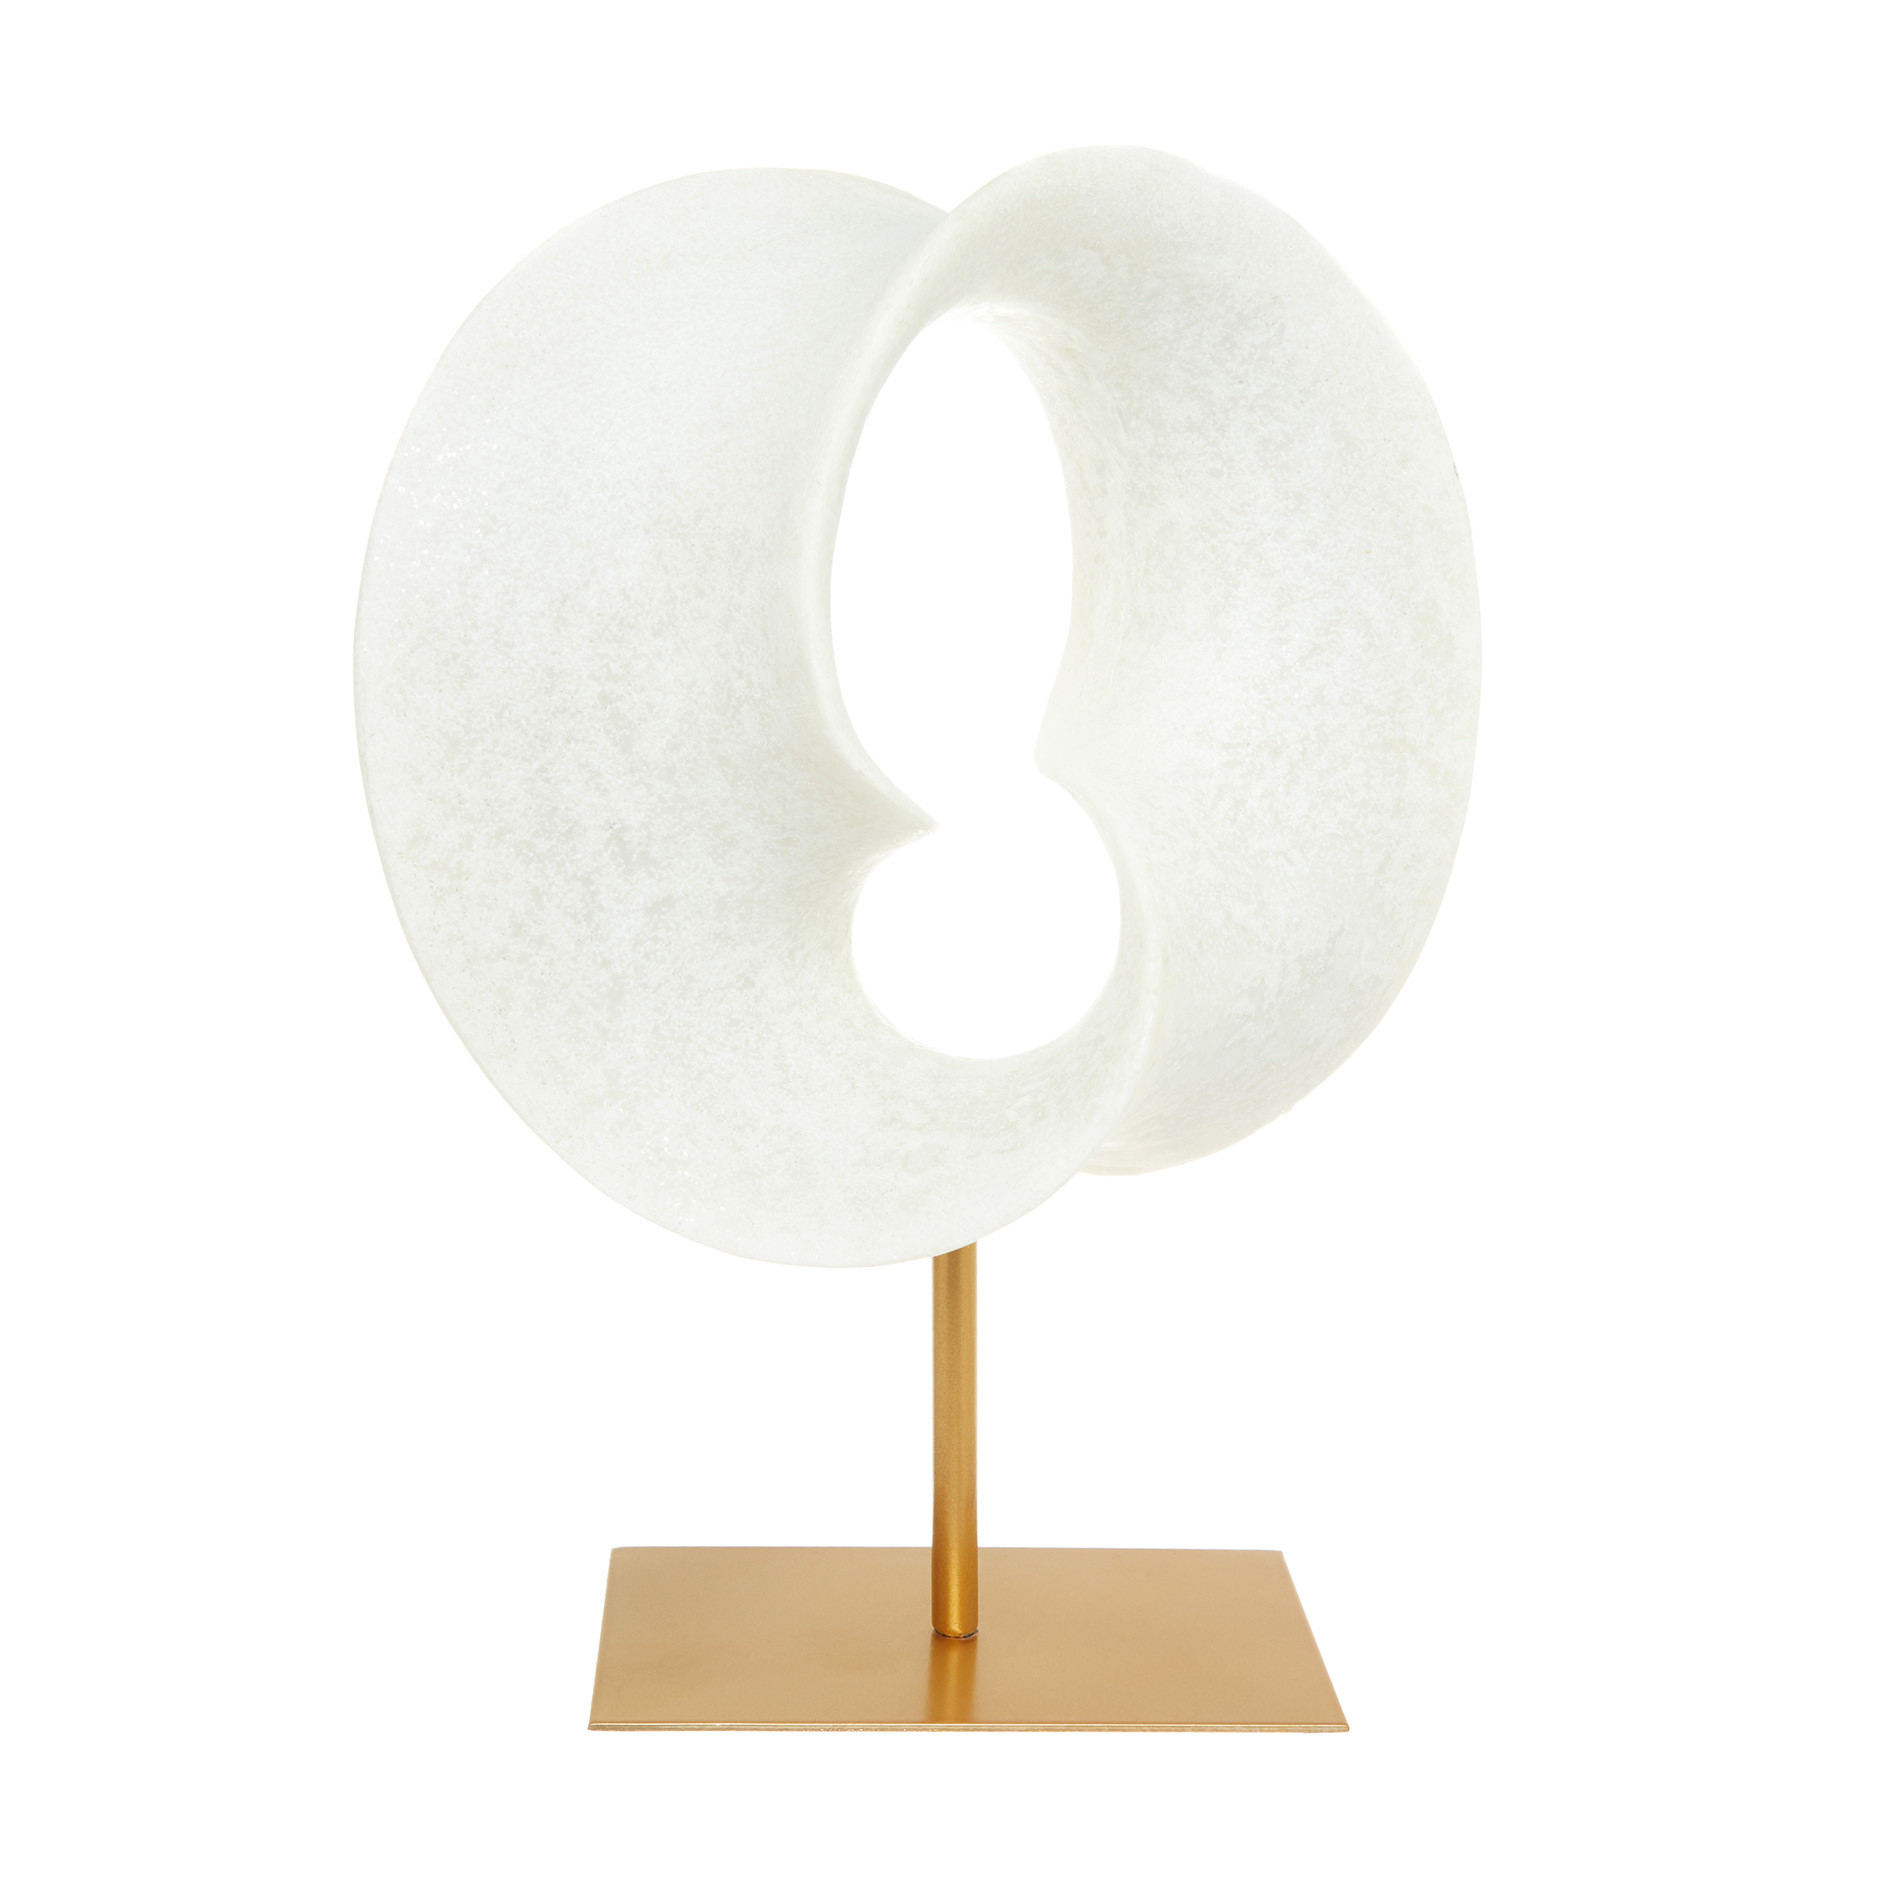 Scultura astratta su stand rifinita a mano, Bianco, large image number 0